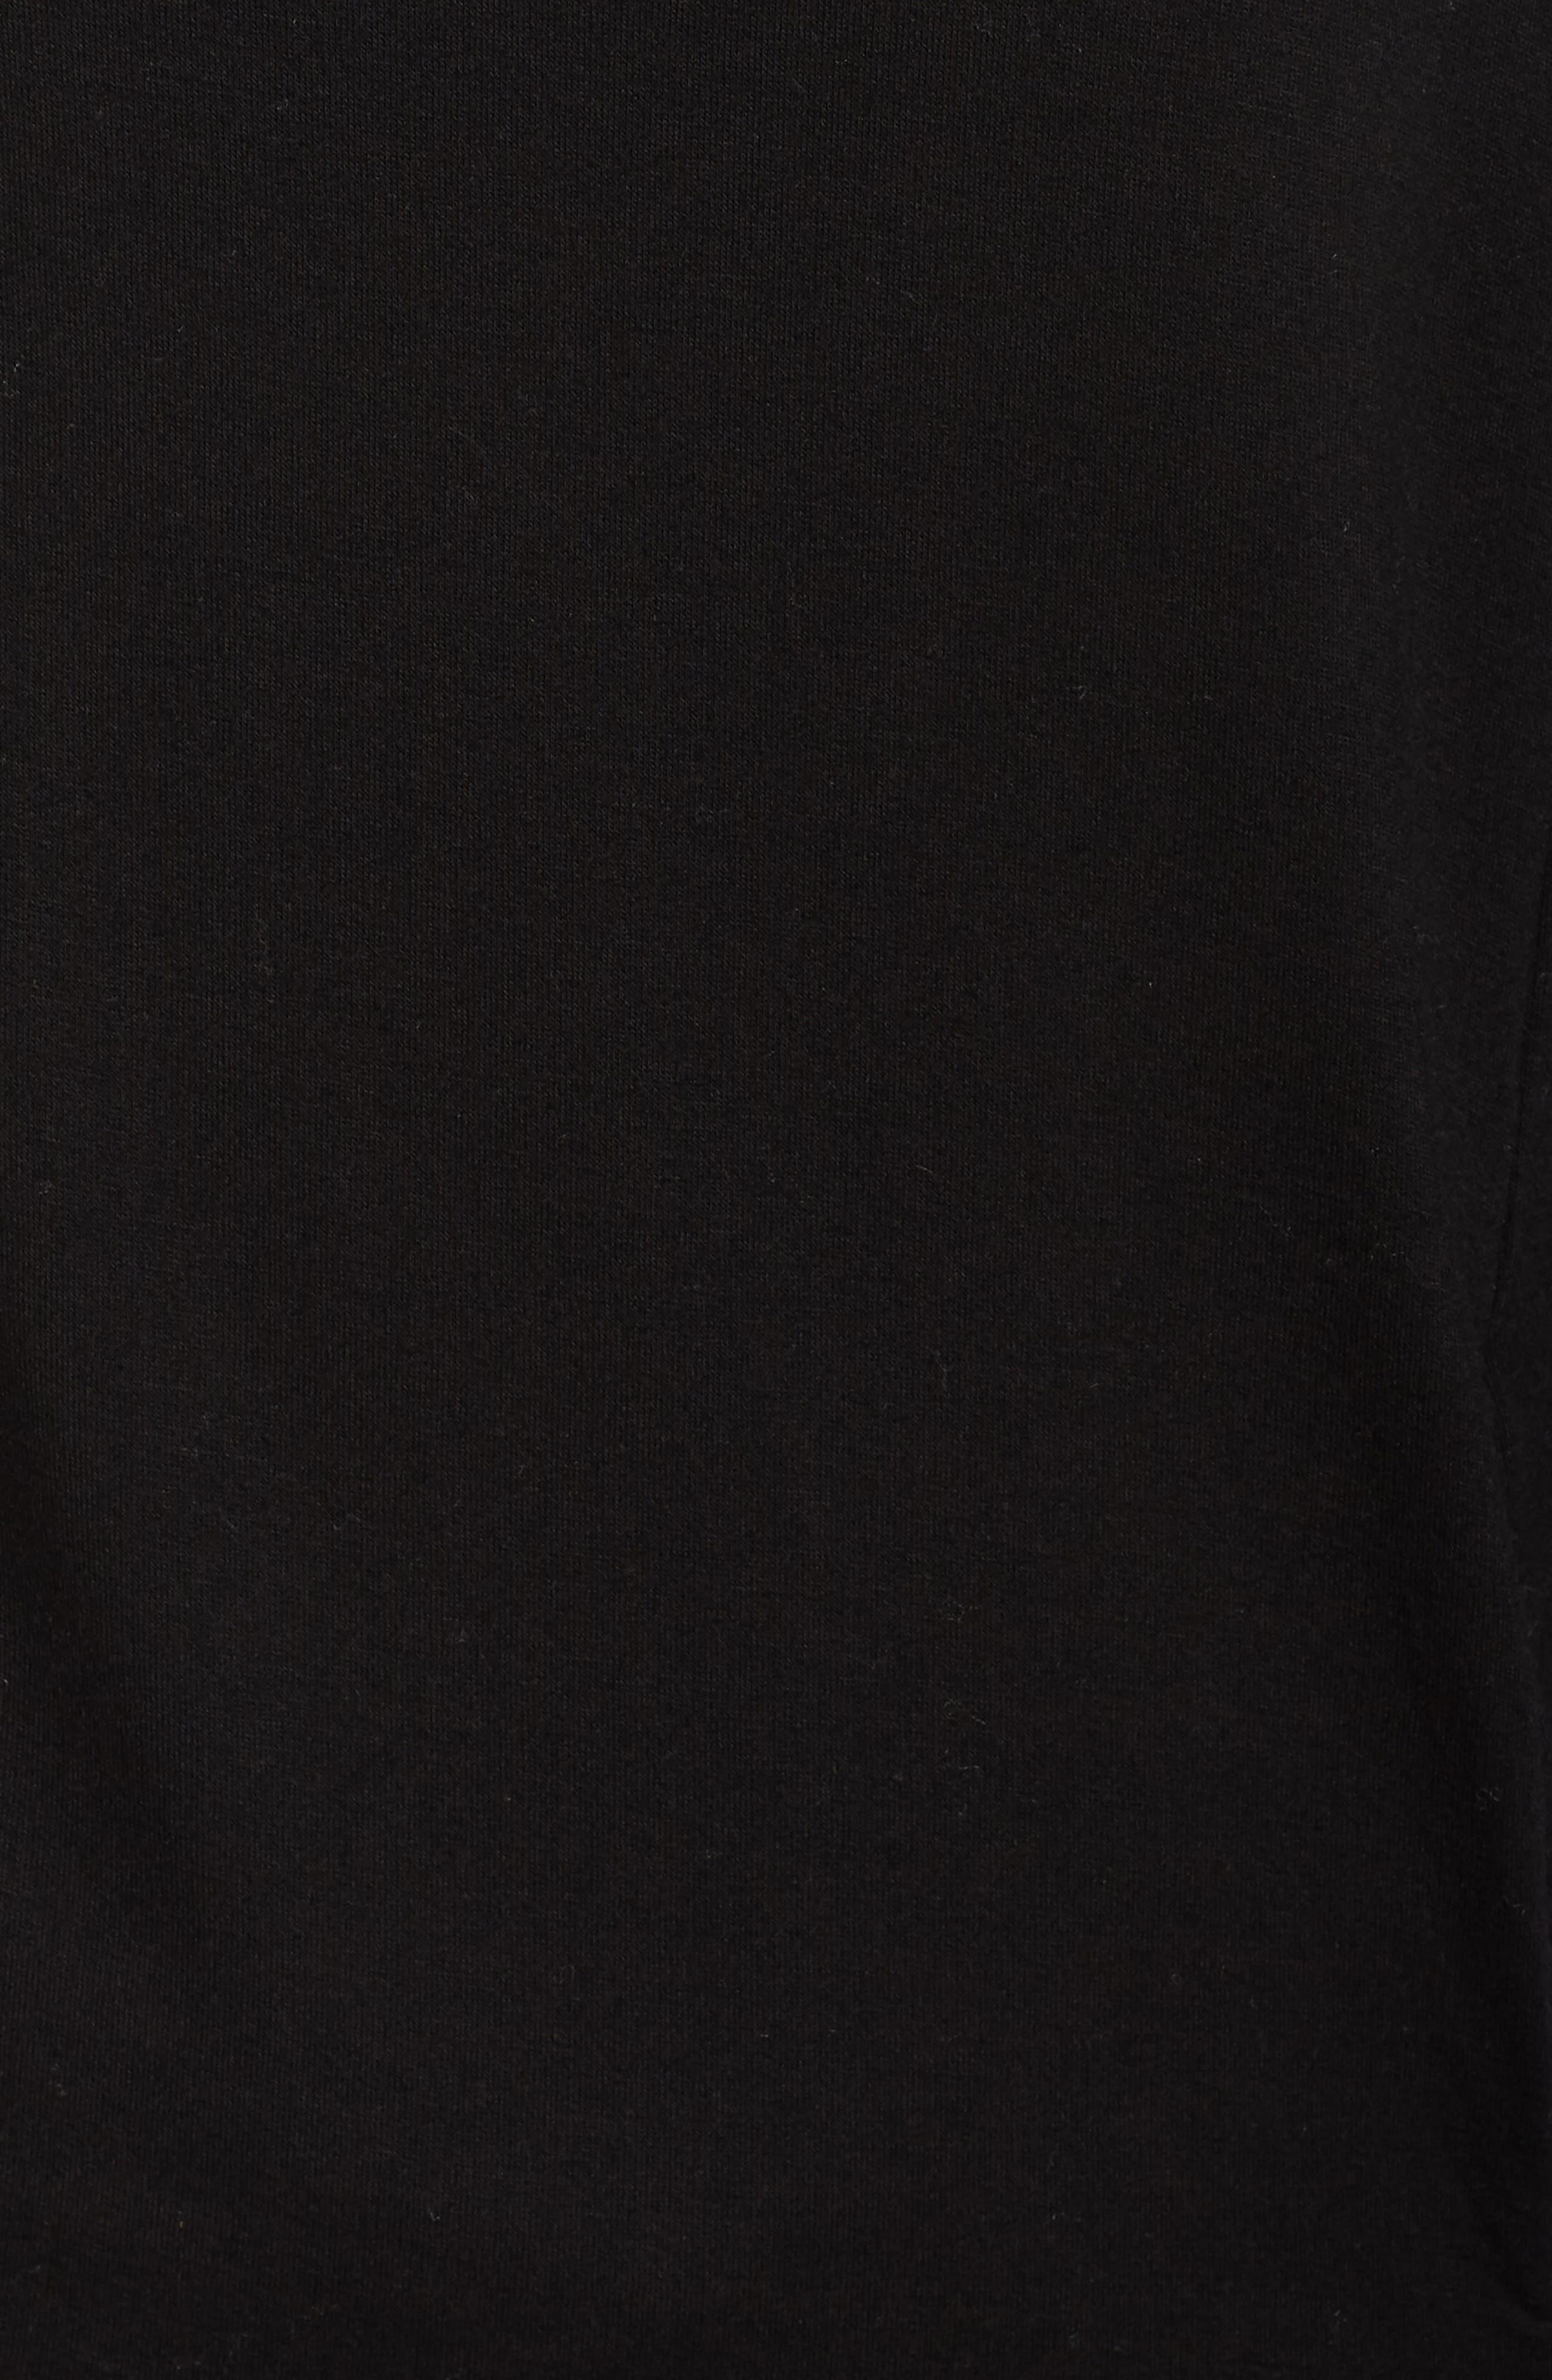 Grateful Cowl Neck Pullover,                             Alternate thumbnail 6, color,                             BLACK SAND